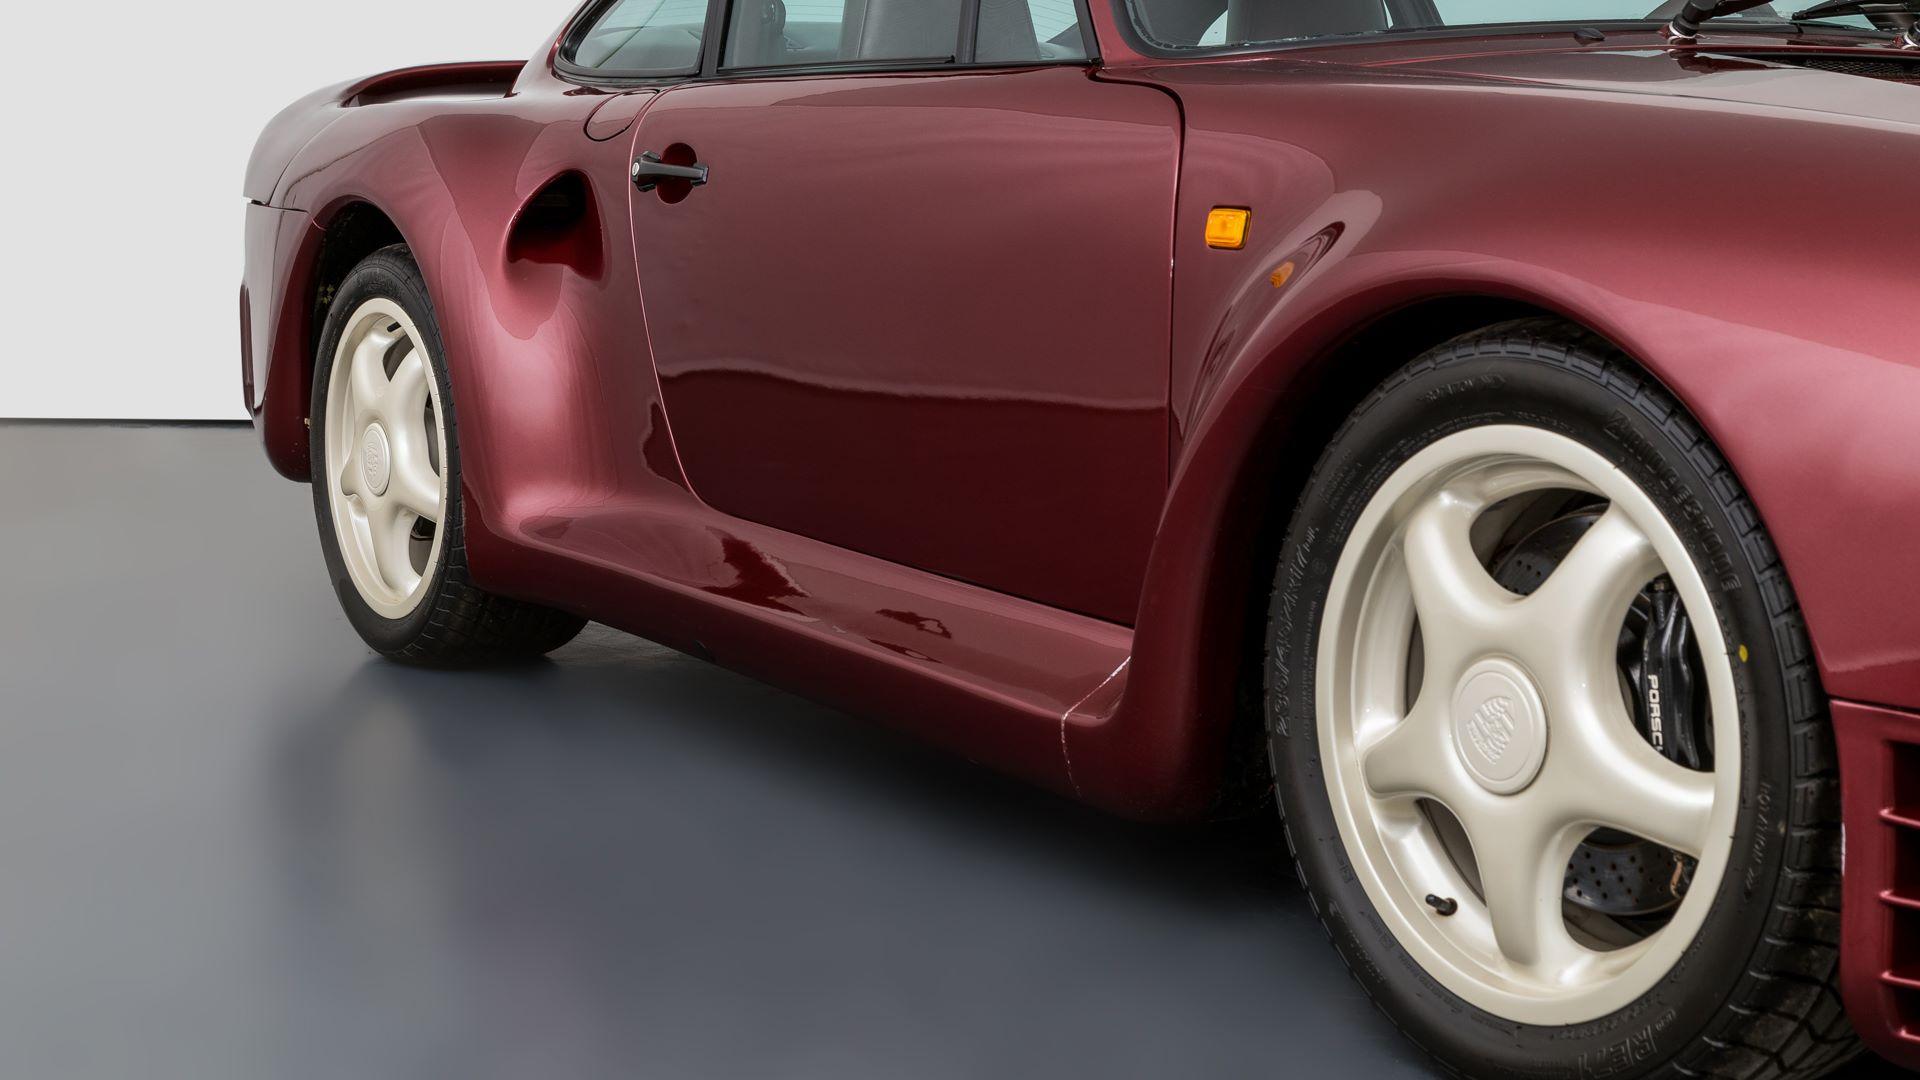 Porsche-959-Prototype-1985-for-sale-6